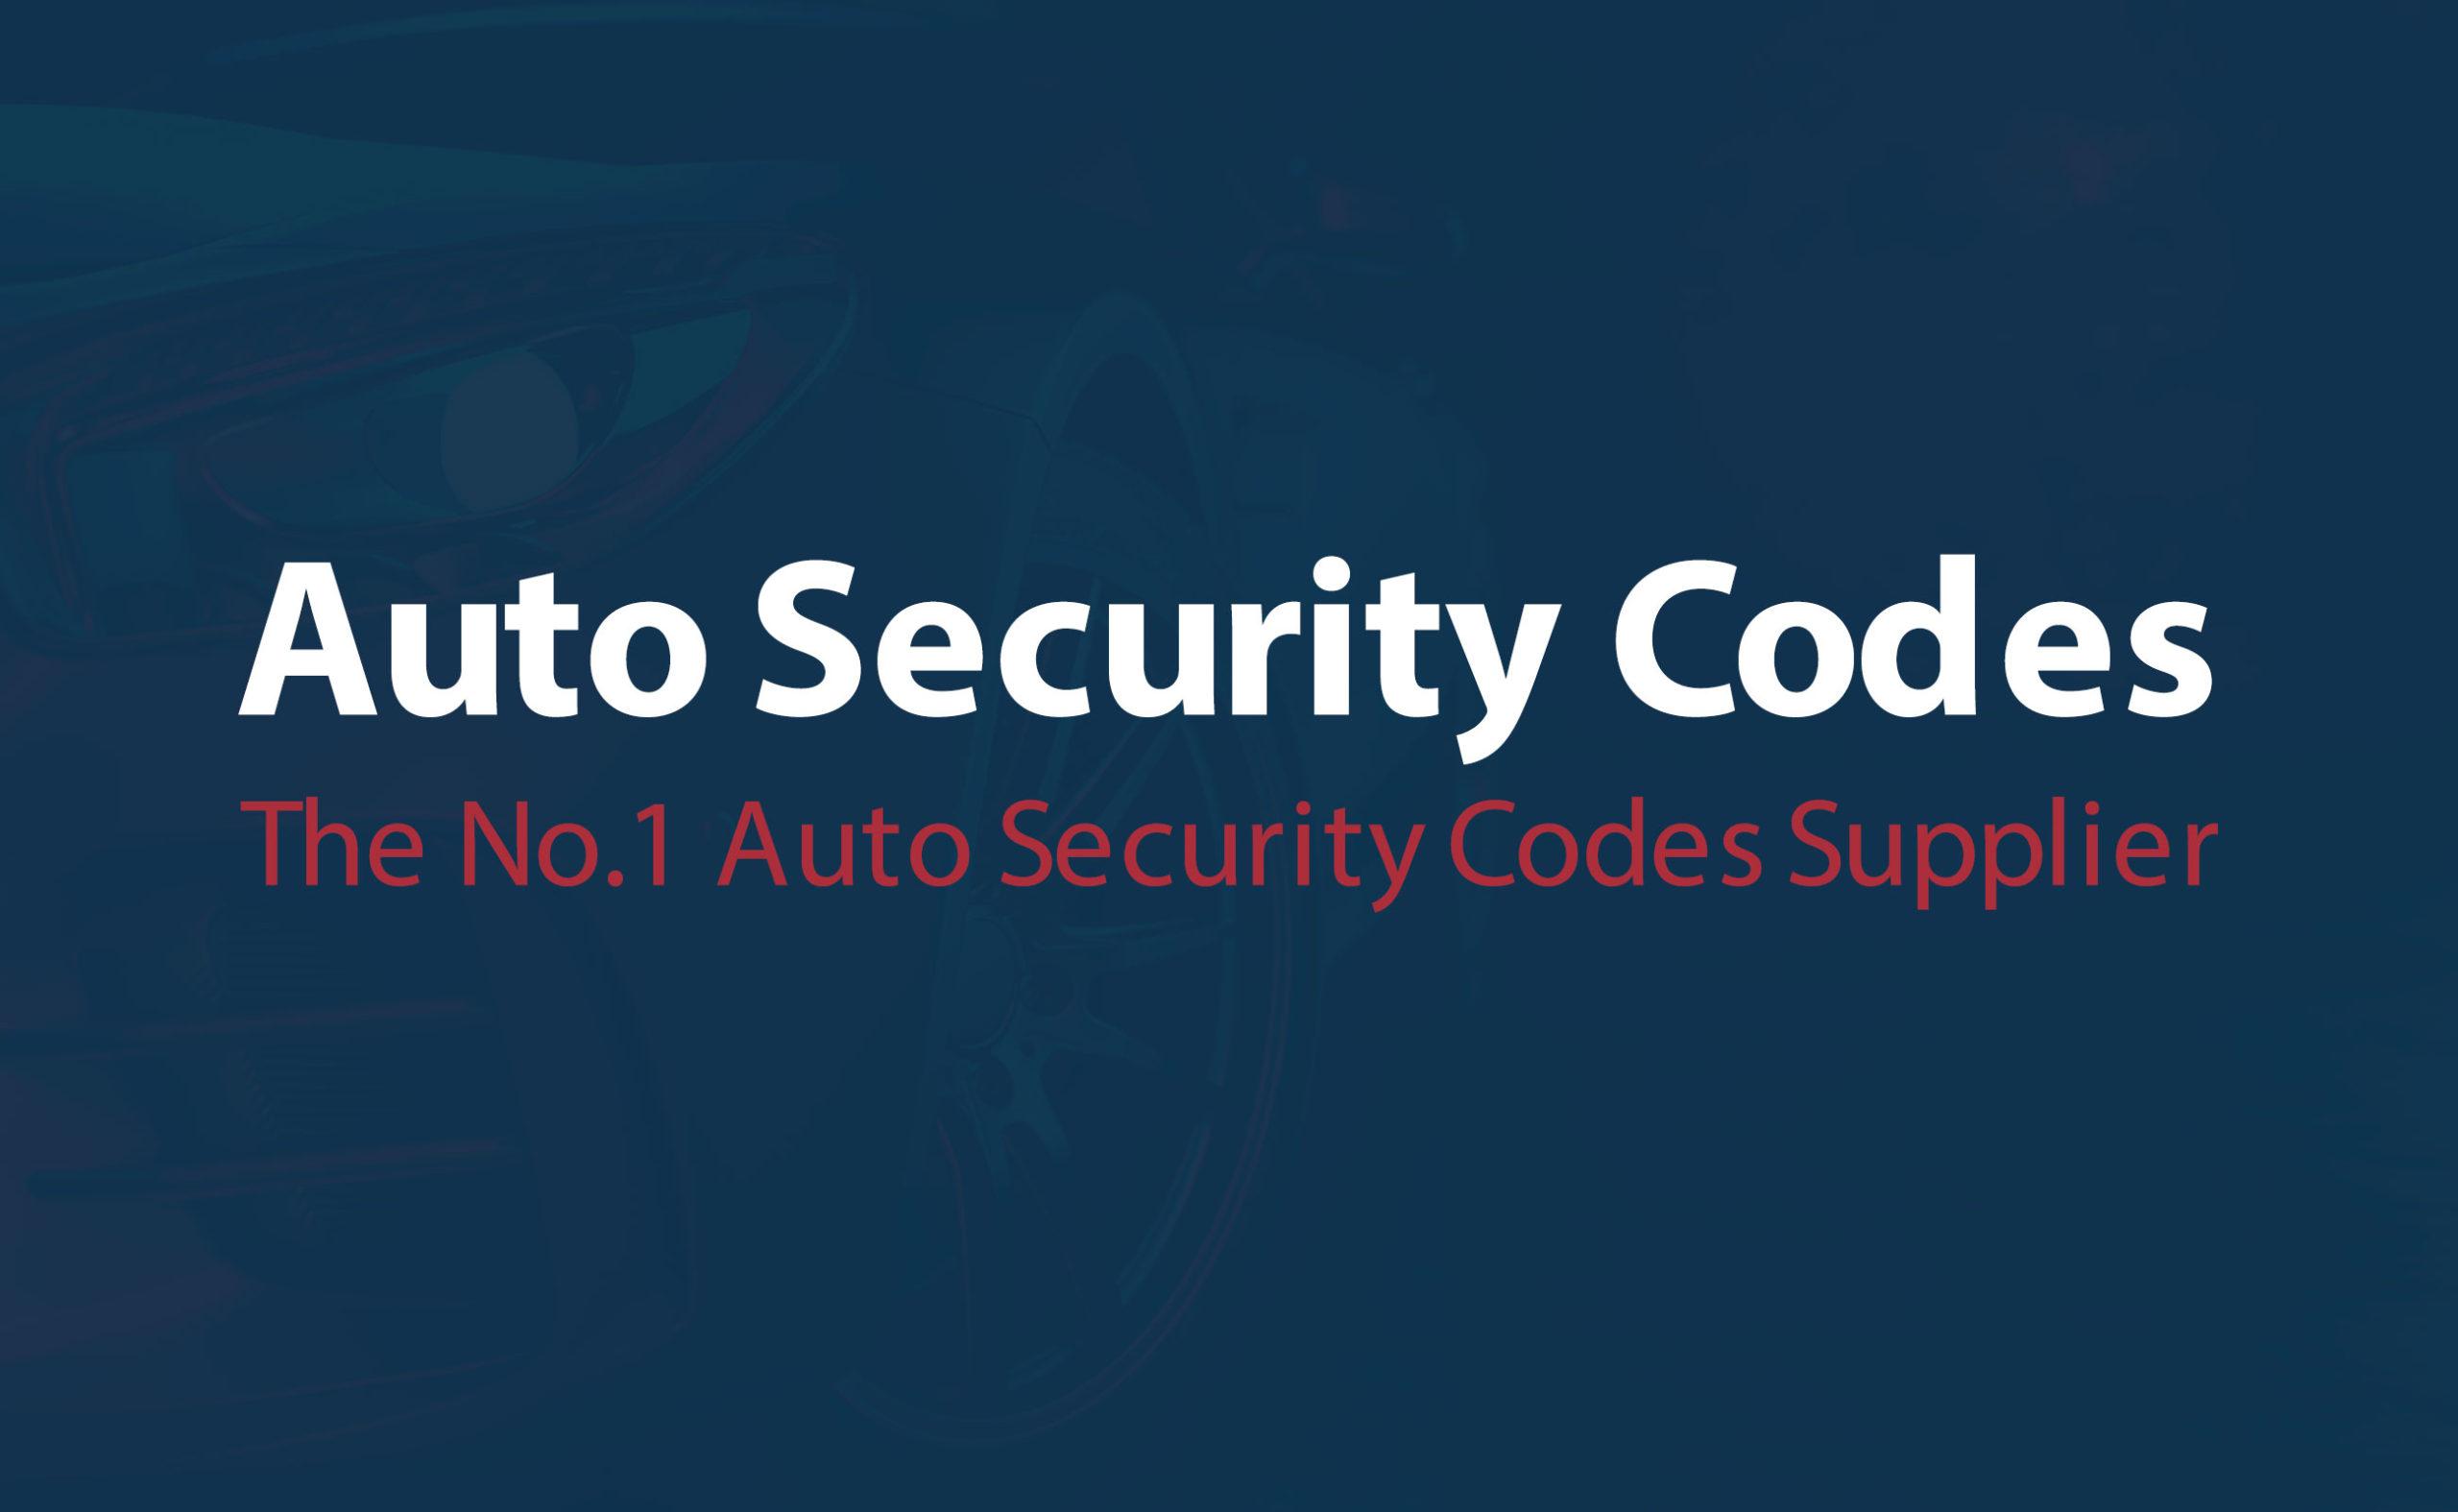 Auto Security Codes